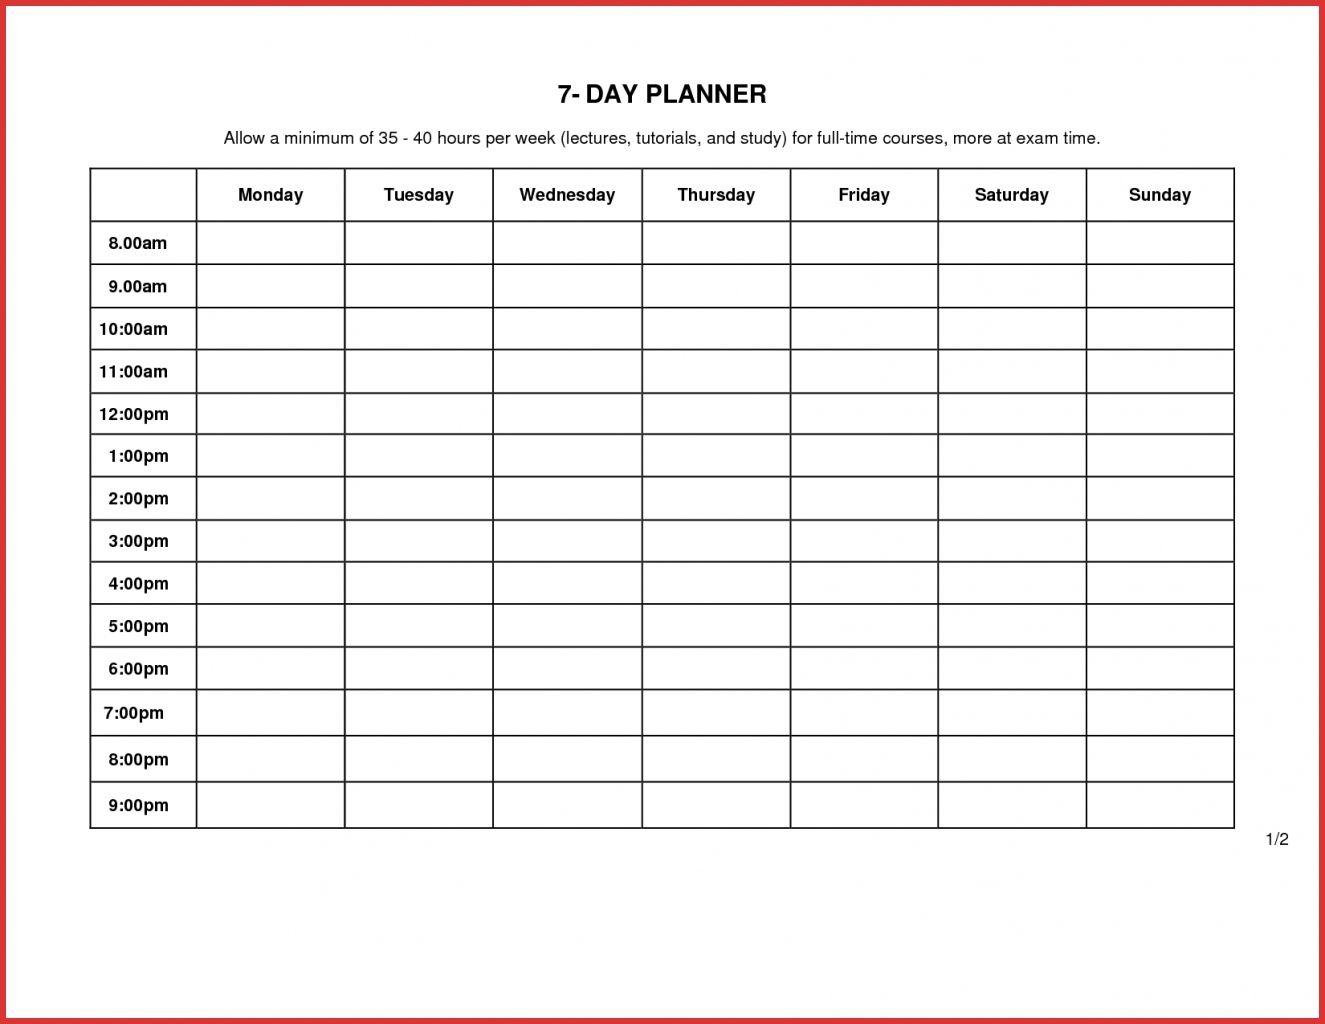 Schedule Template Blank Day Calendar Free Week Printable | Smorad pertaining to Blank 7 Day Calendar Template